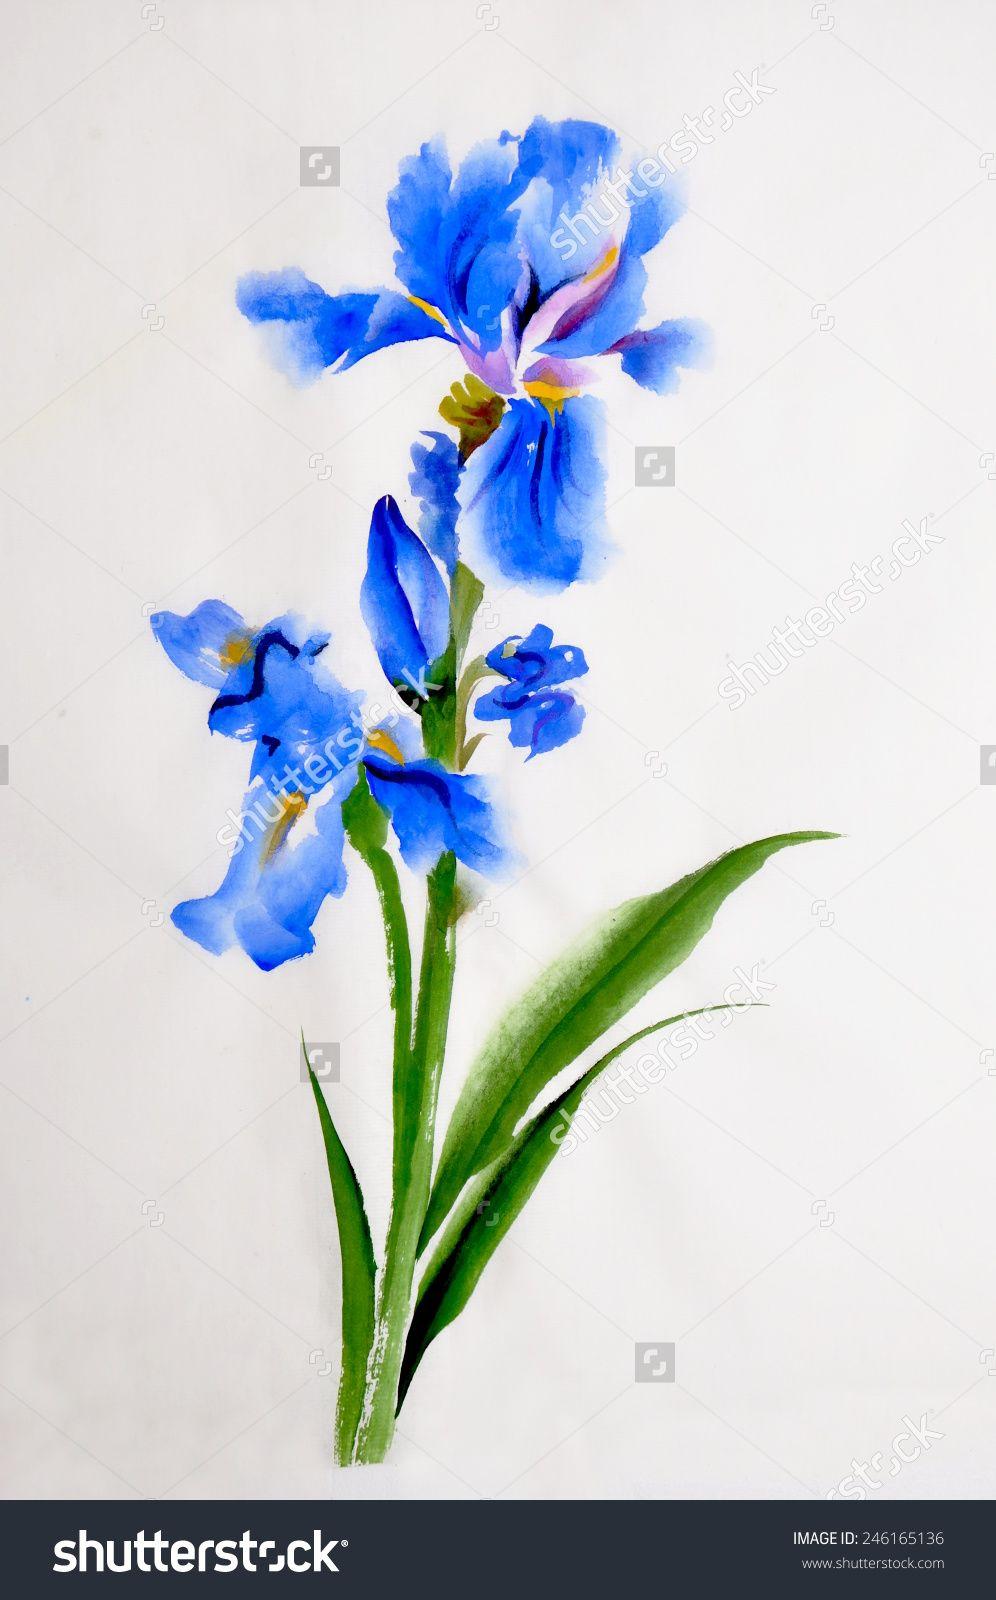 Pin By Alina Klainer On Blue Iris Pinterest Watercolor Flowers